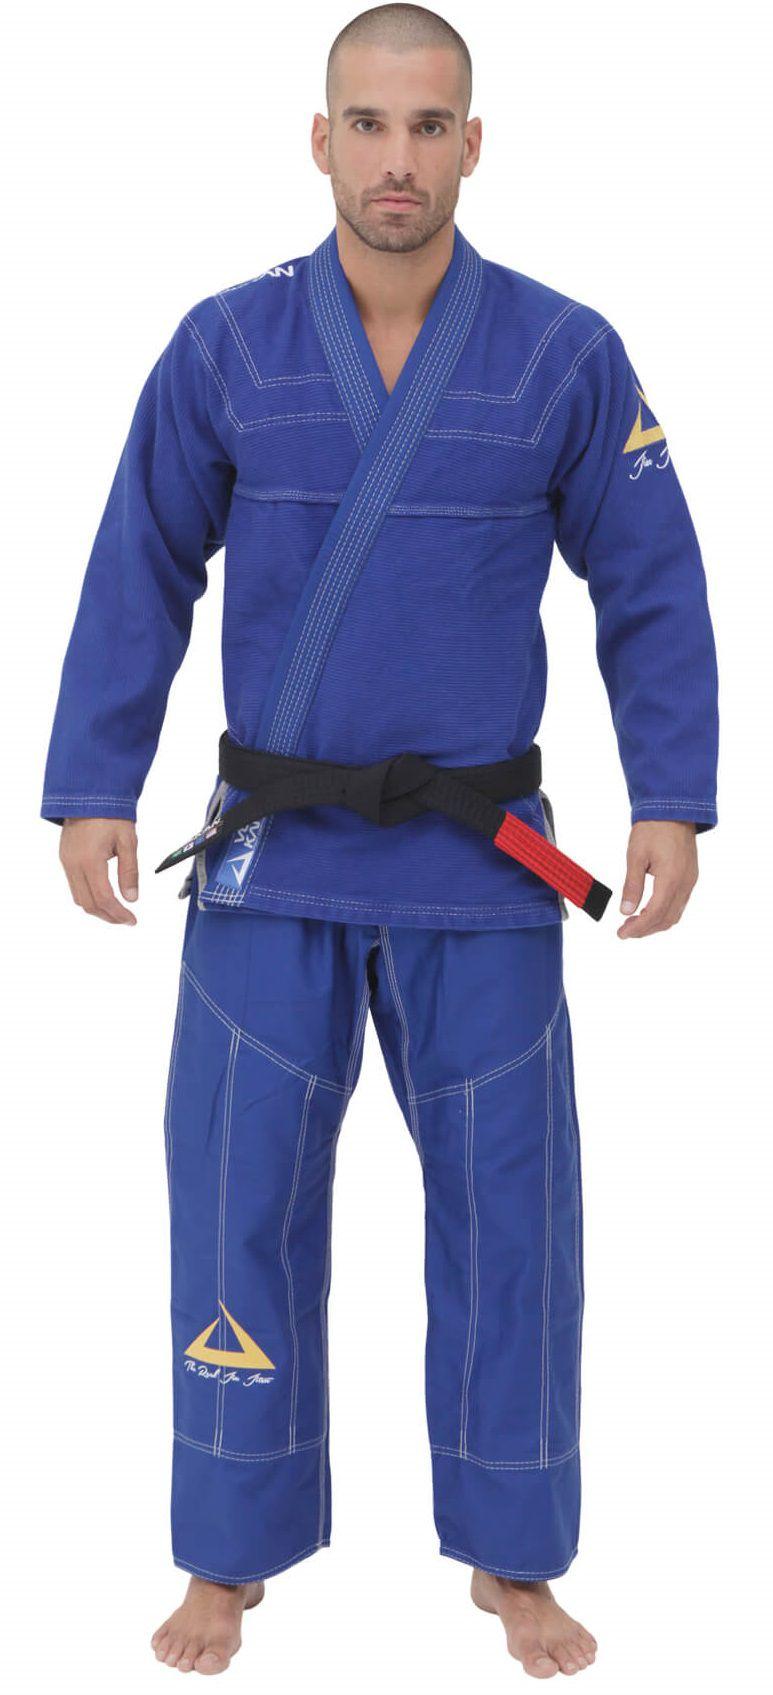 Kimono Vulkan Para Jiu-jitsu Profissional Adulto - SKY PRO AZUL ROYAL